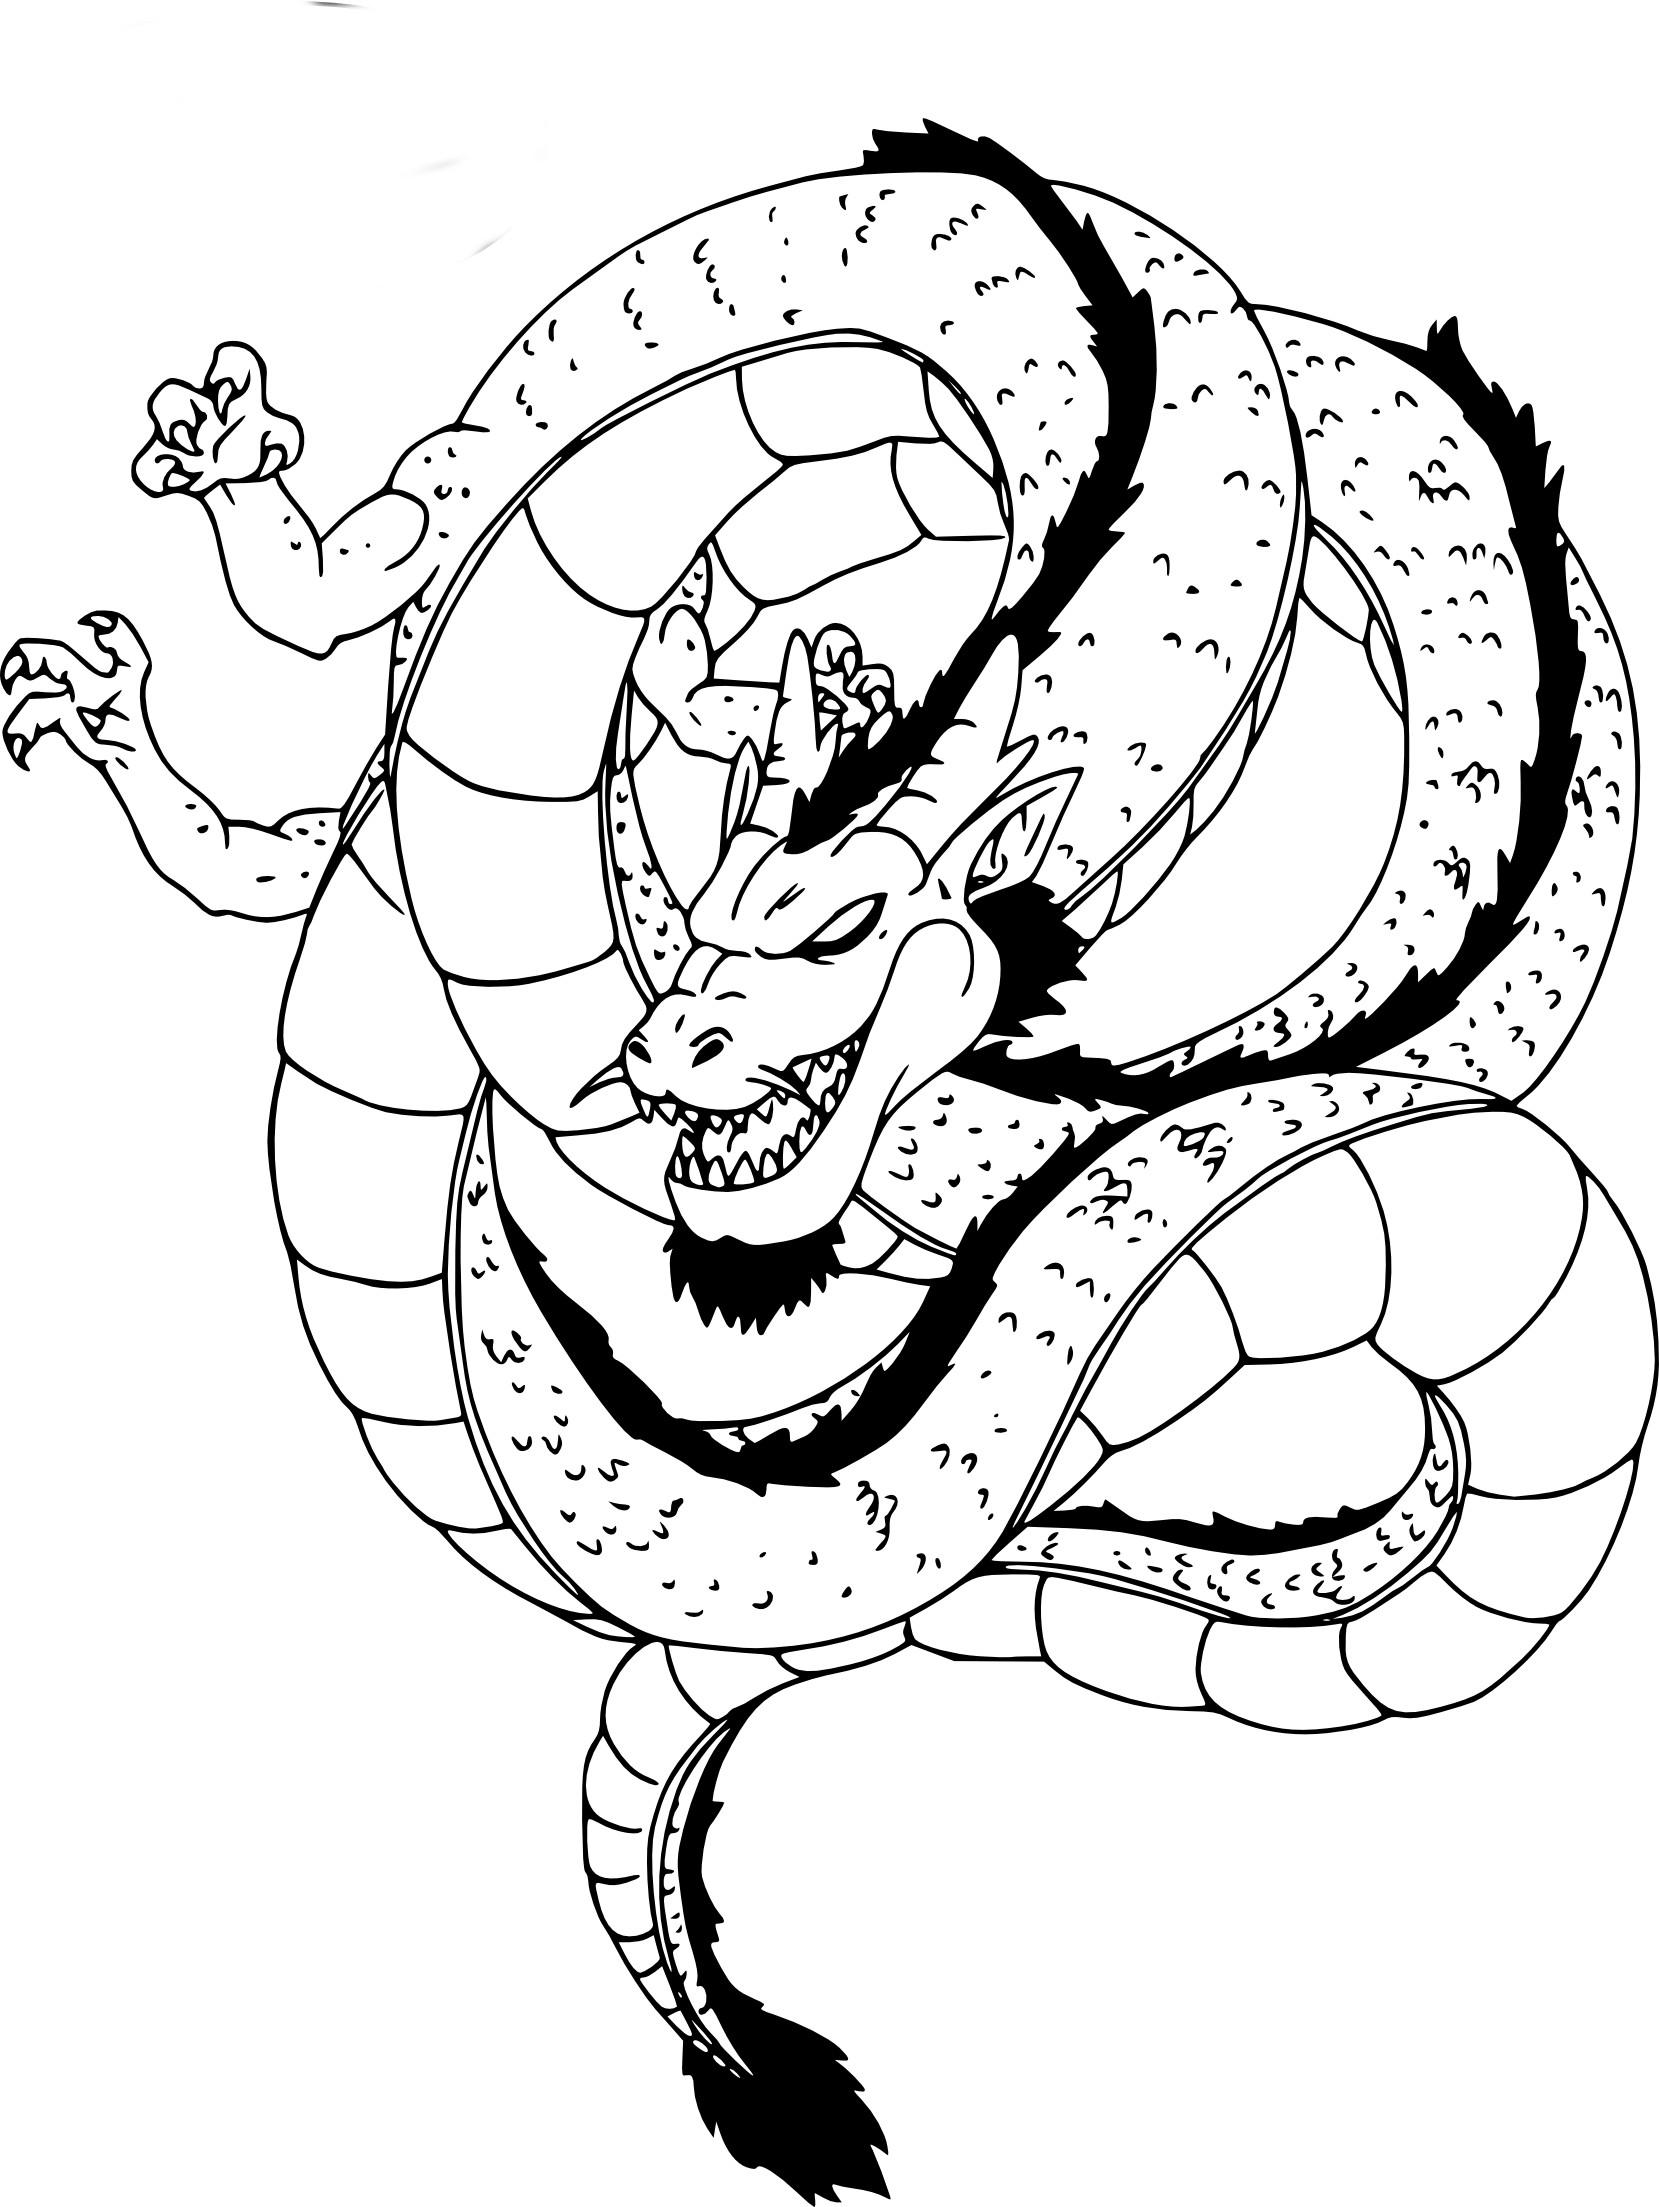 Coloriage Dragon Shenron De Dbz A Imprimer